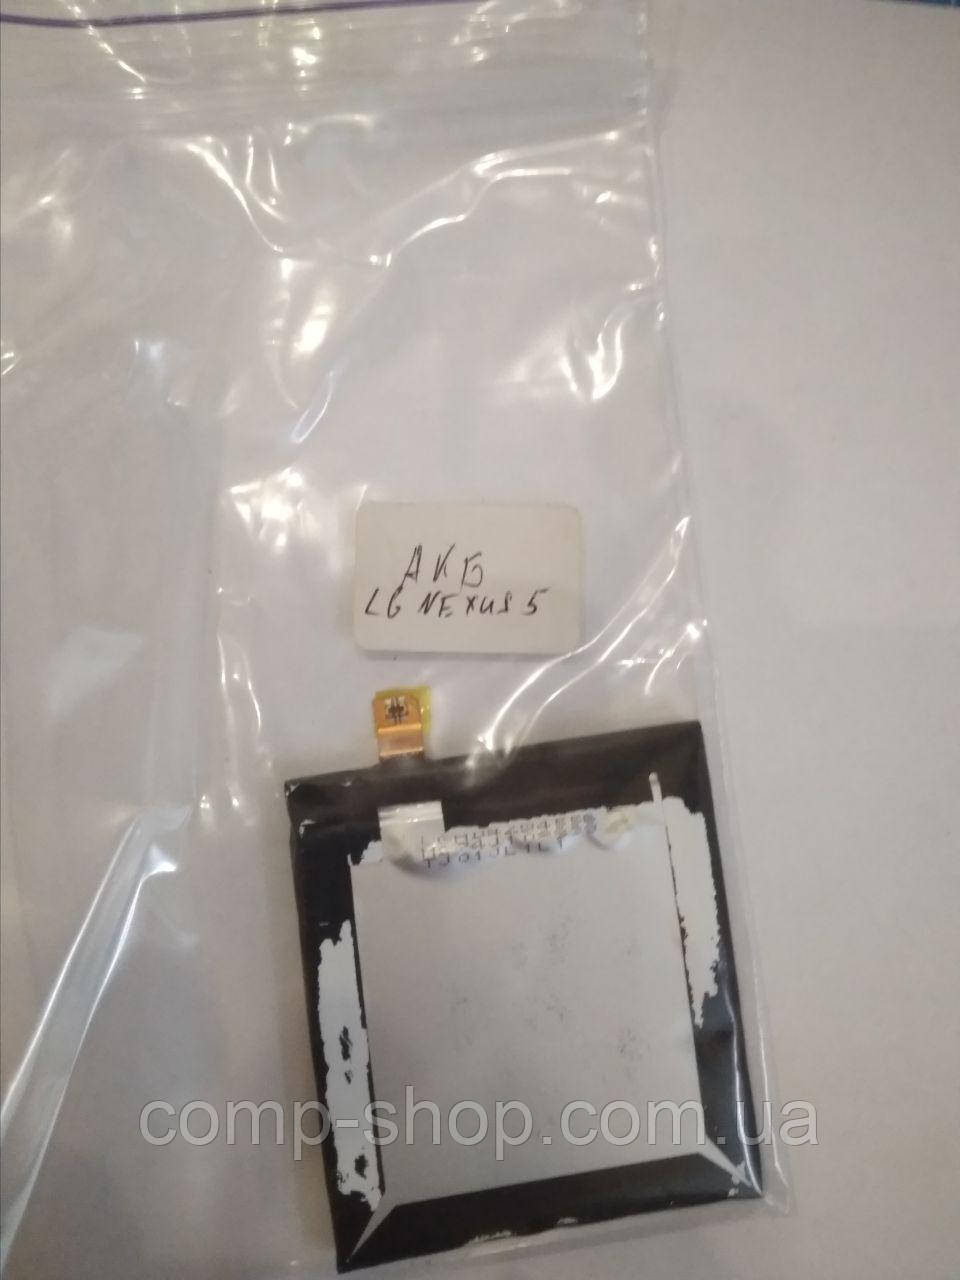 Аккумуляторная батарея LG nexus 5 бу, запчасть с разборки